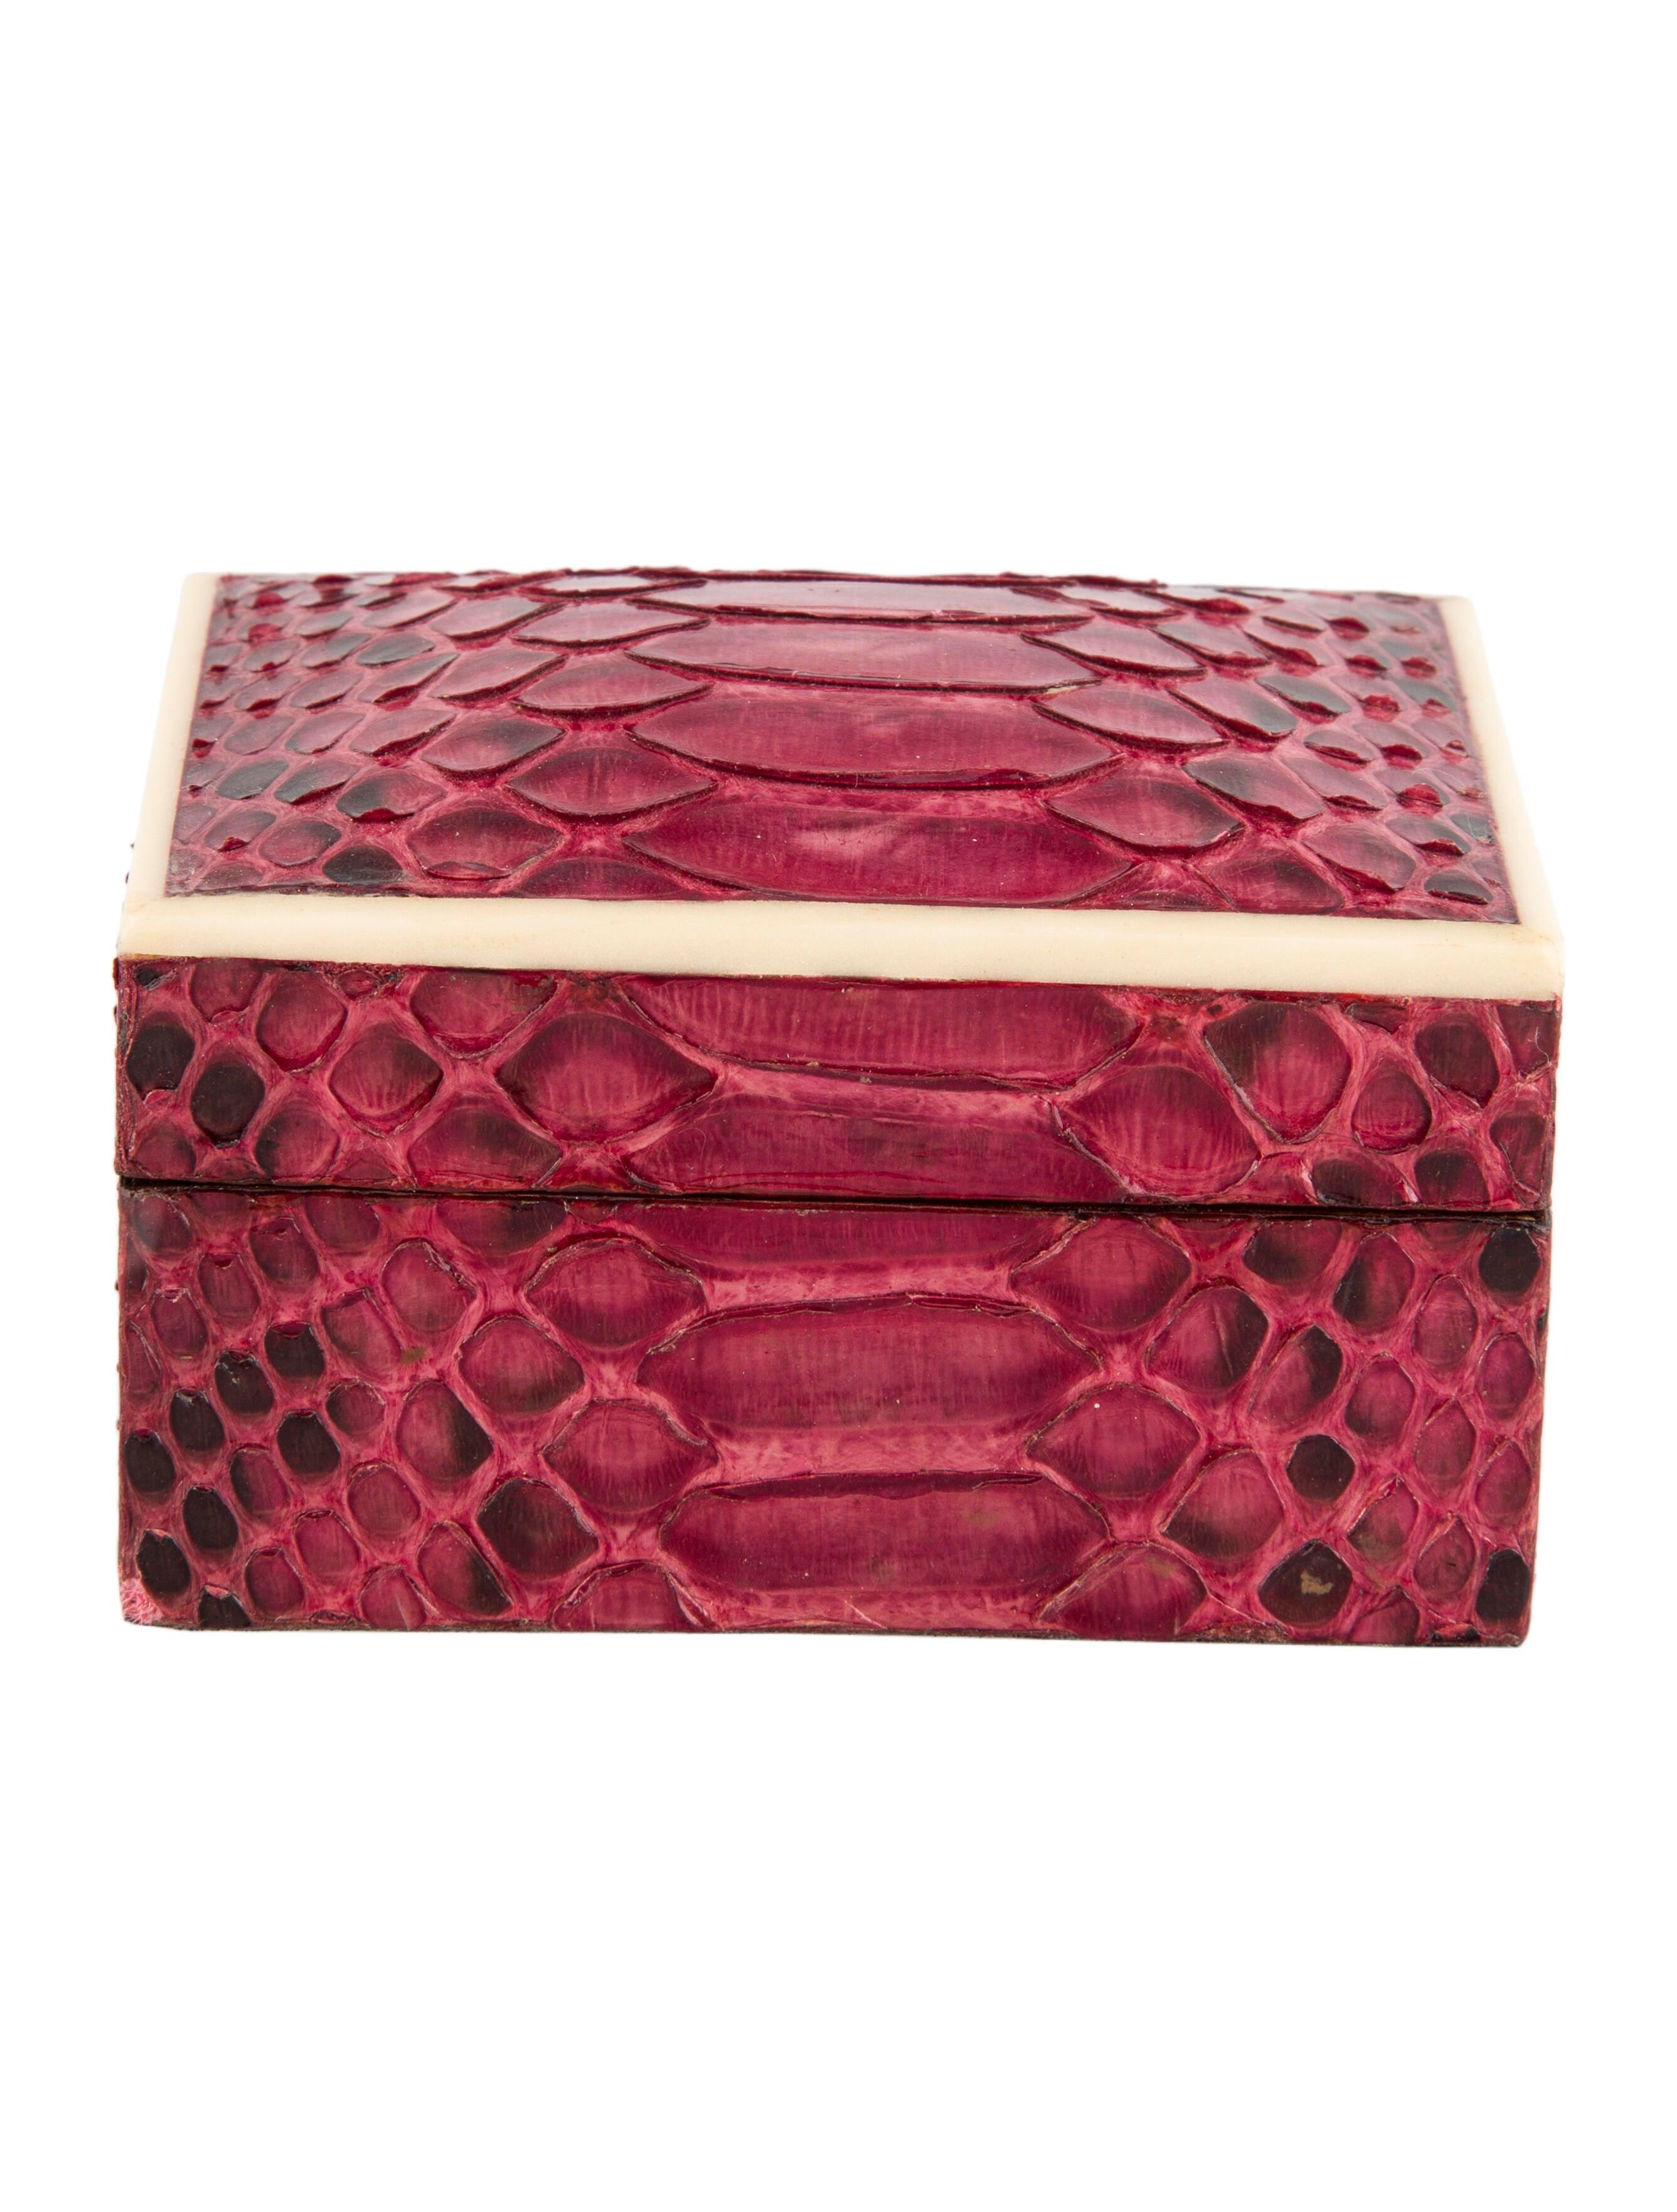 R&Y Augousti Python Trinket Box - Decor & Accessories -           RAY20708 | The RealReal